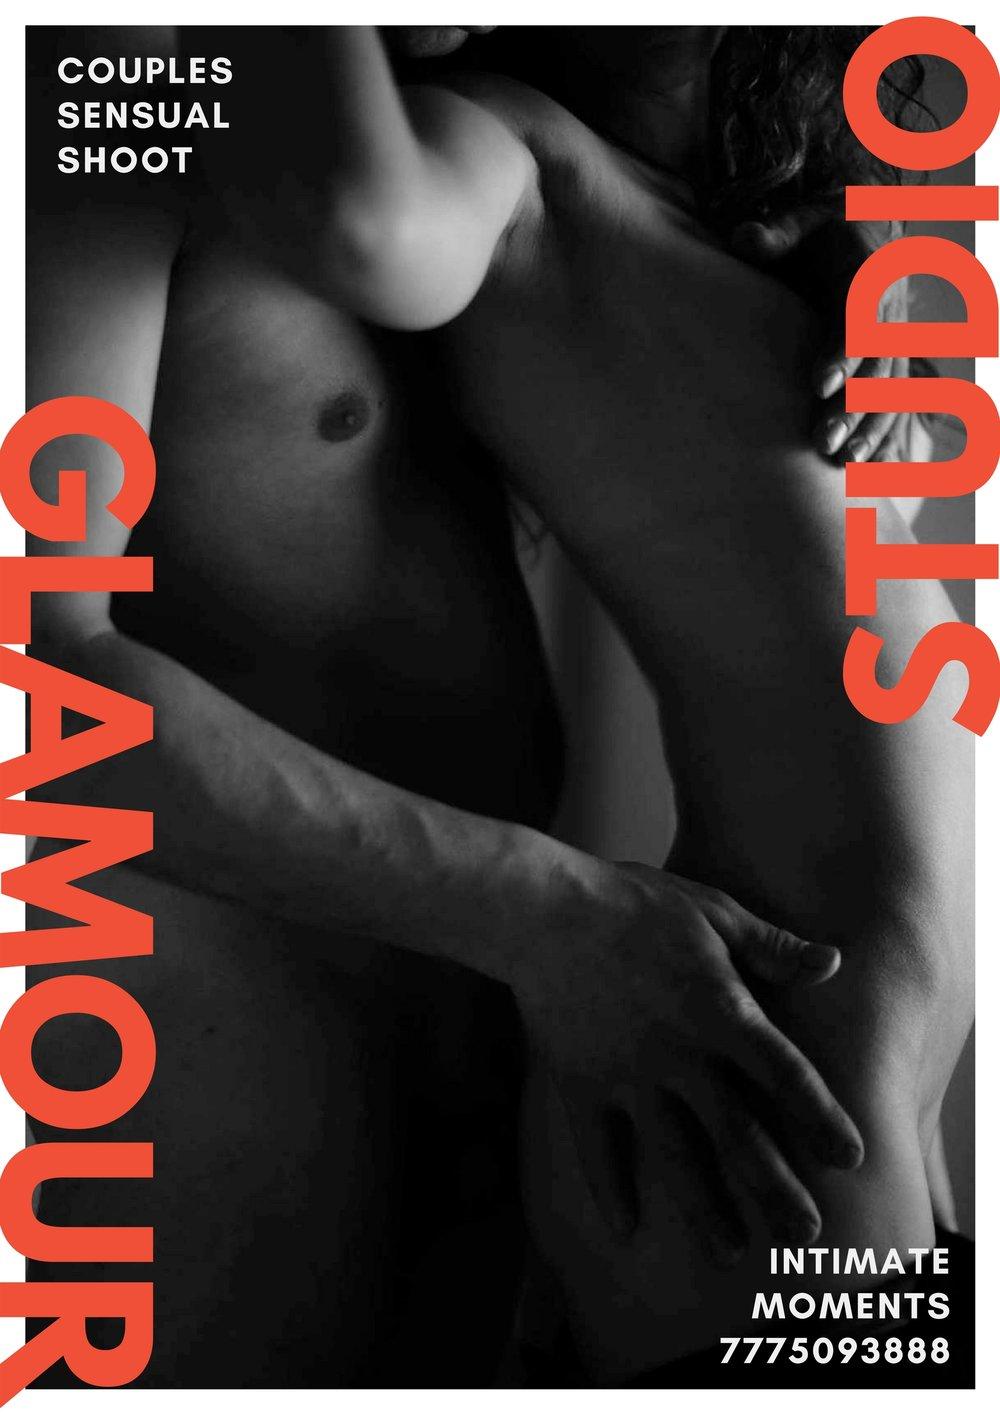 9juliawinterstudiolondon2018studioglamour couples boudoir photoshoot london.jpg